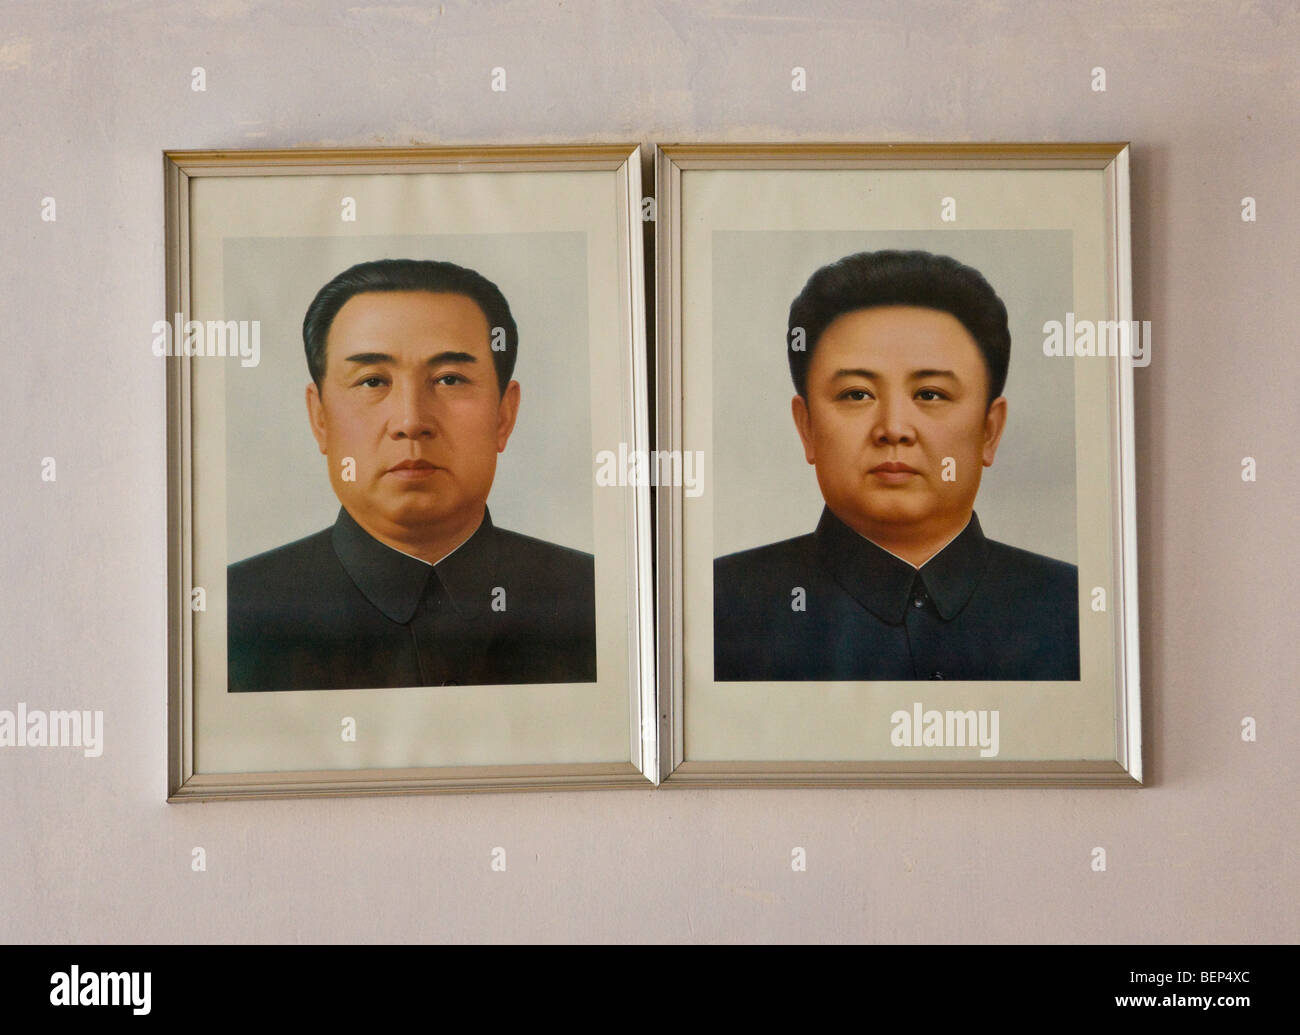 Poster of leaders, Kim Il-Sung and Kim Jong-Il, North Korea - Stock Image